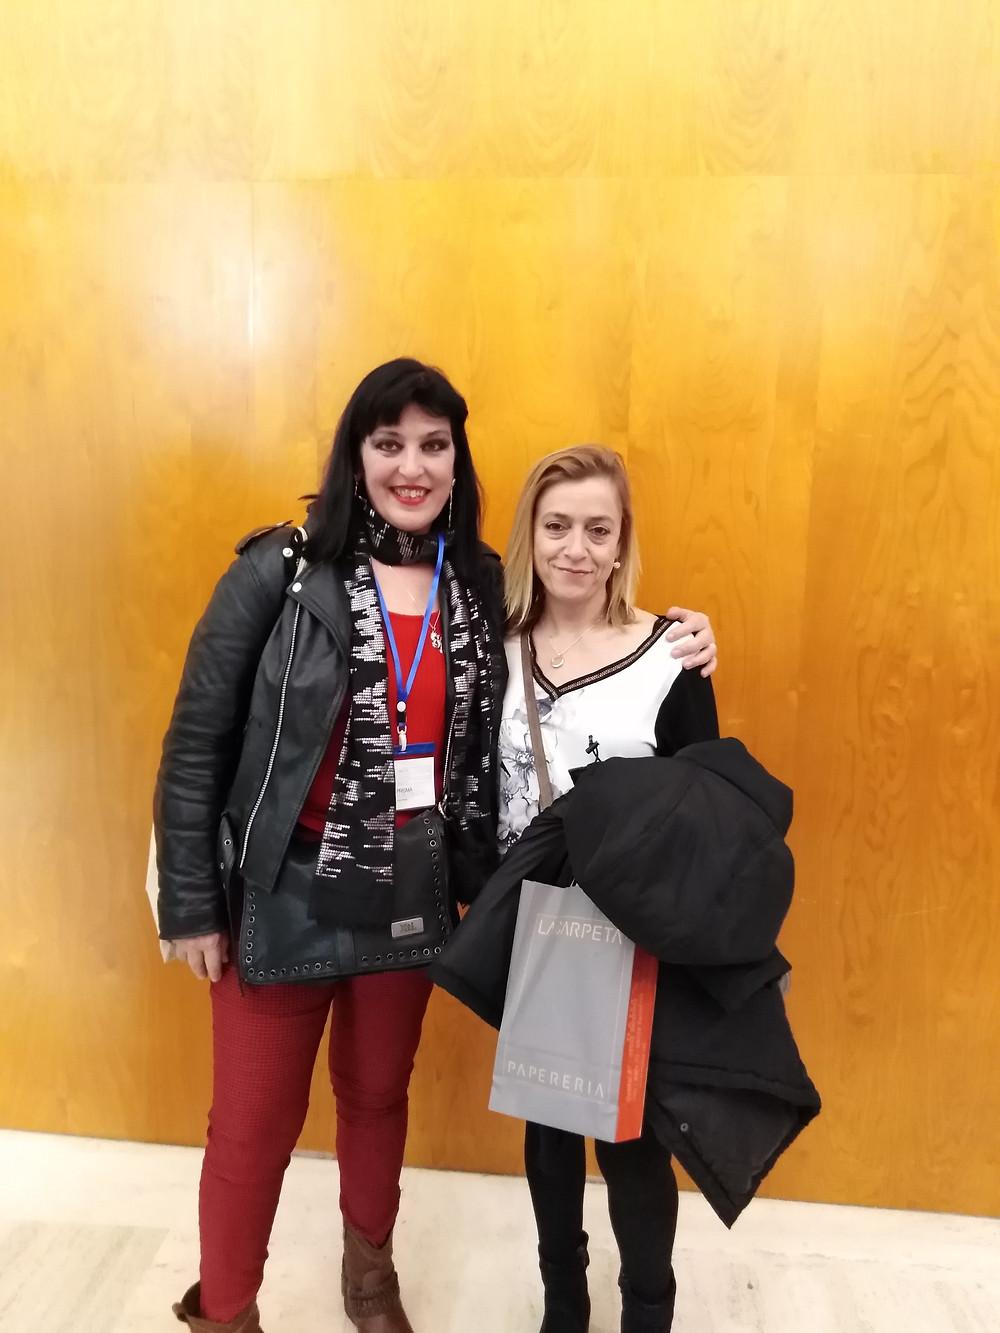 Con mi querida editora, Esther Escoriza